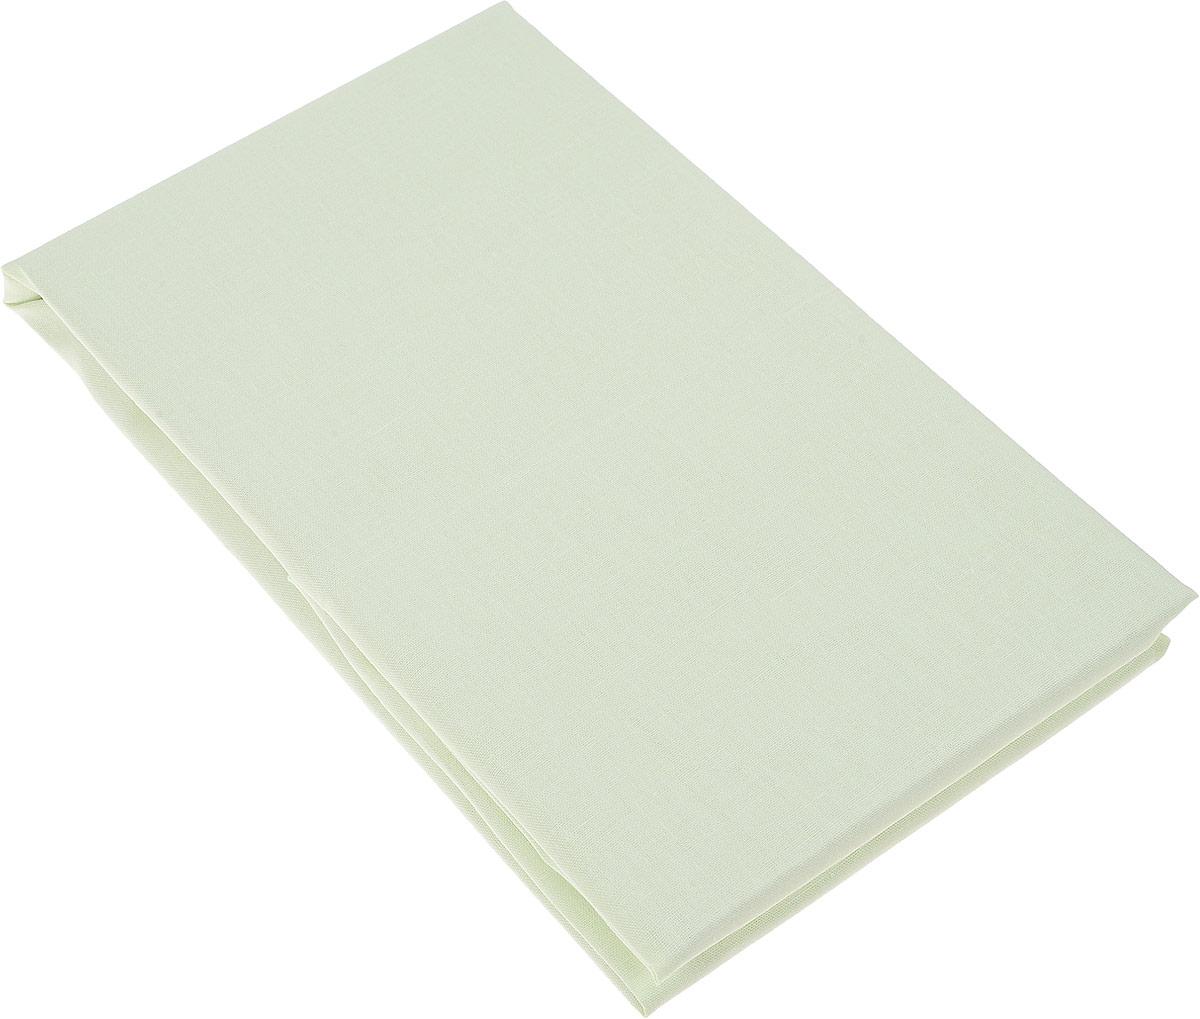 Наволочка Style, цвет: зеленый, 52 х 74 см наволочка primavelle style цвет голубой 52 х 74 см